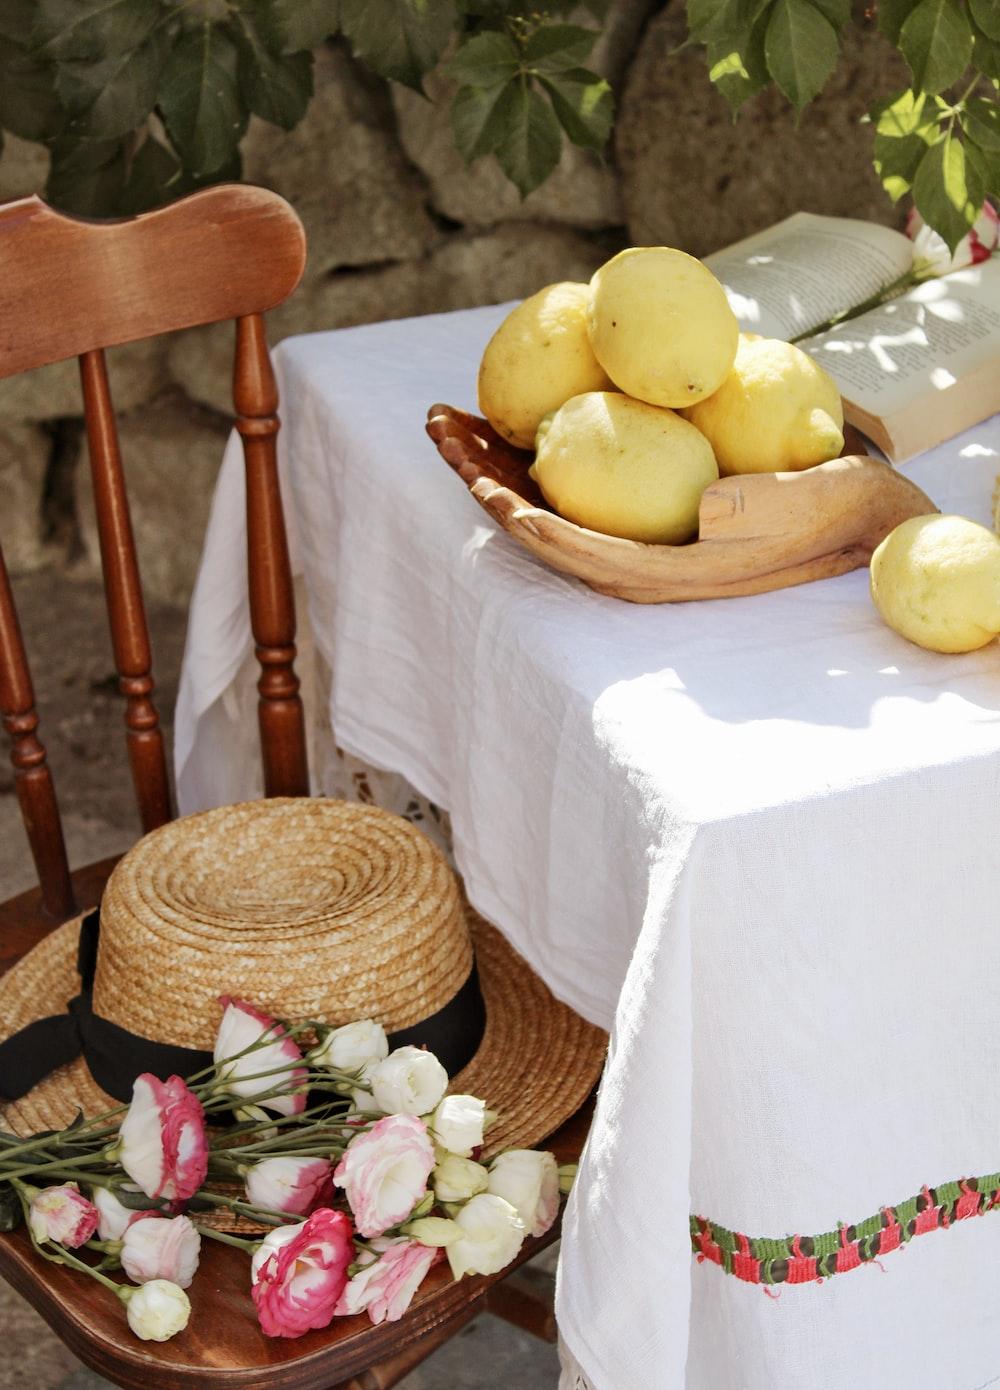 yellow lemon fruit on brown woven basket